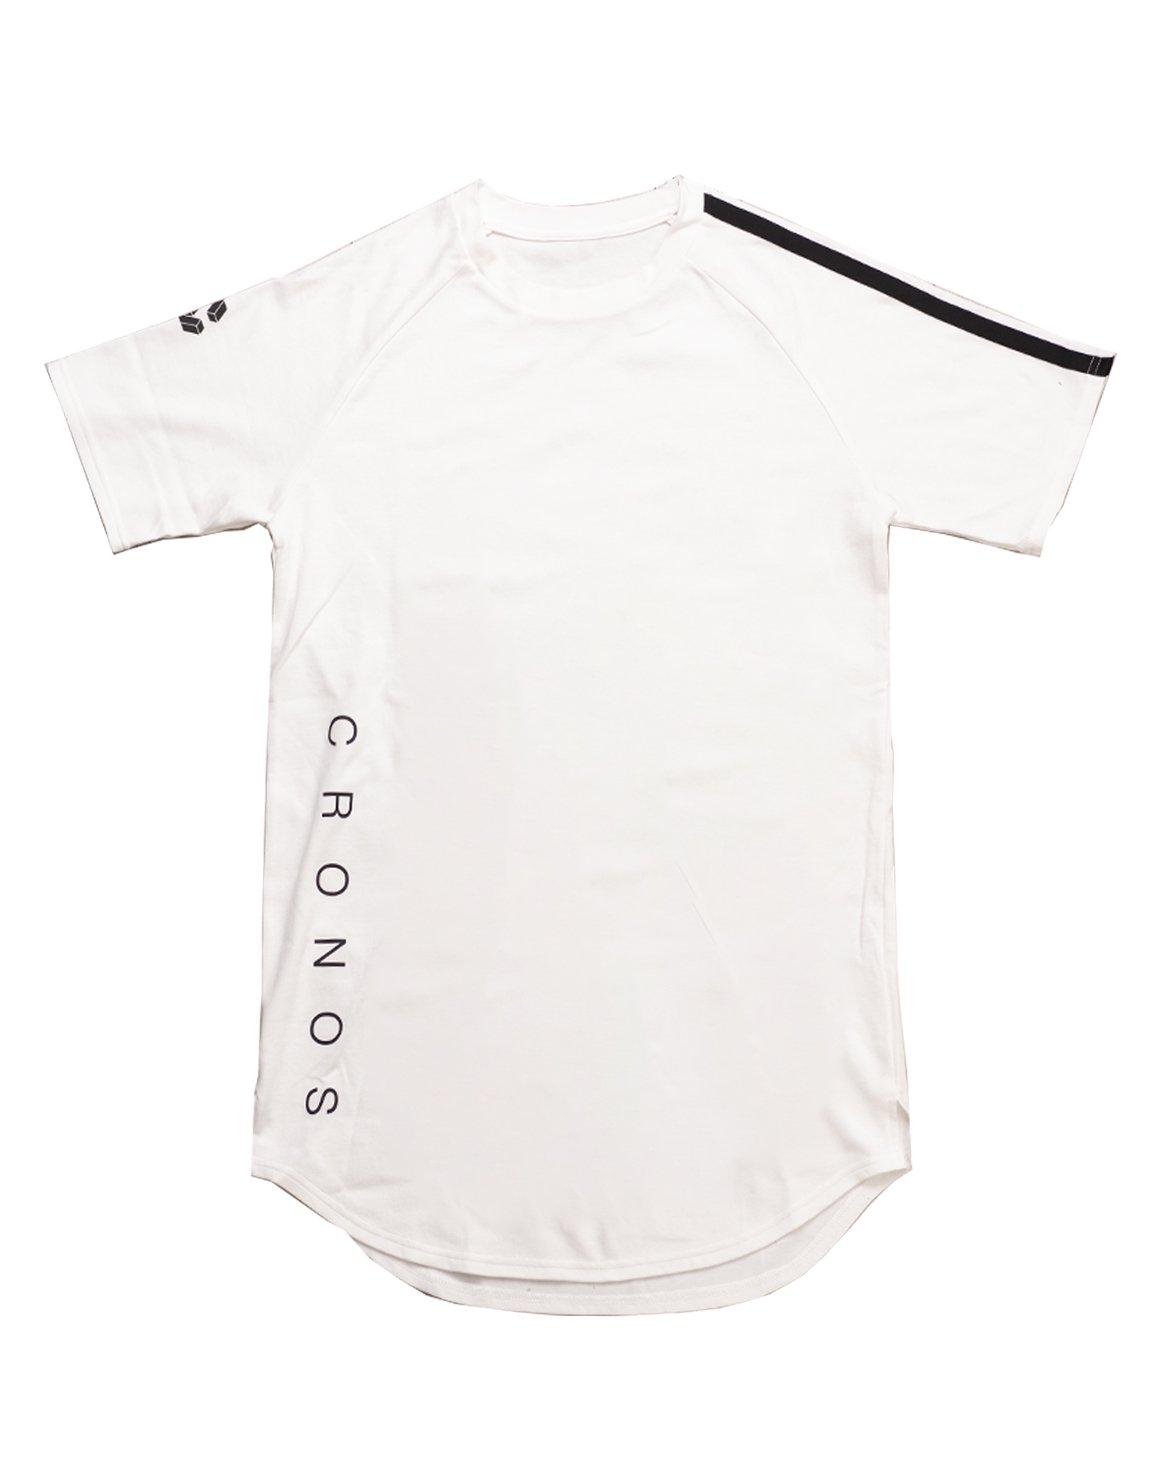 CRONOS SHOULDER TWO LINE T-SHIRTS【WHITE】